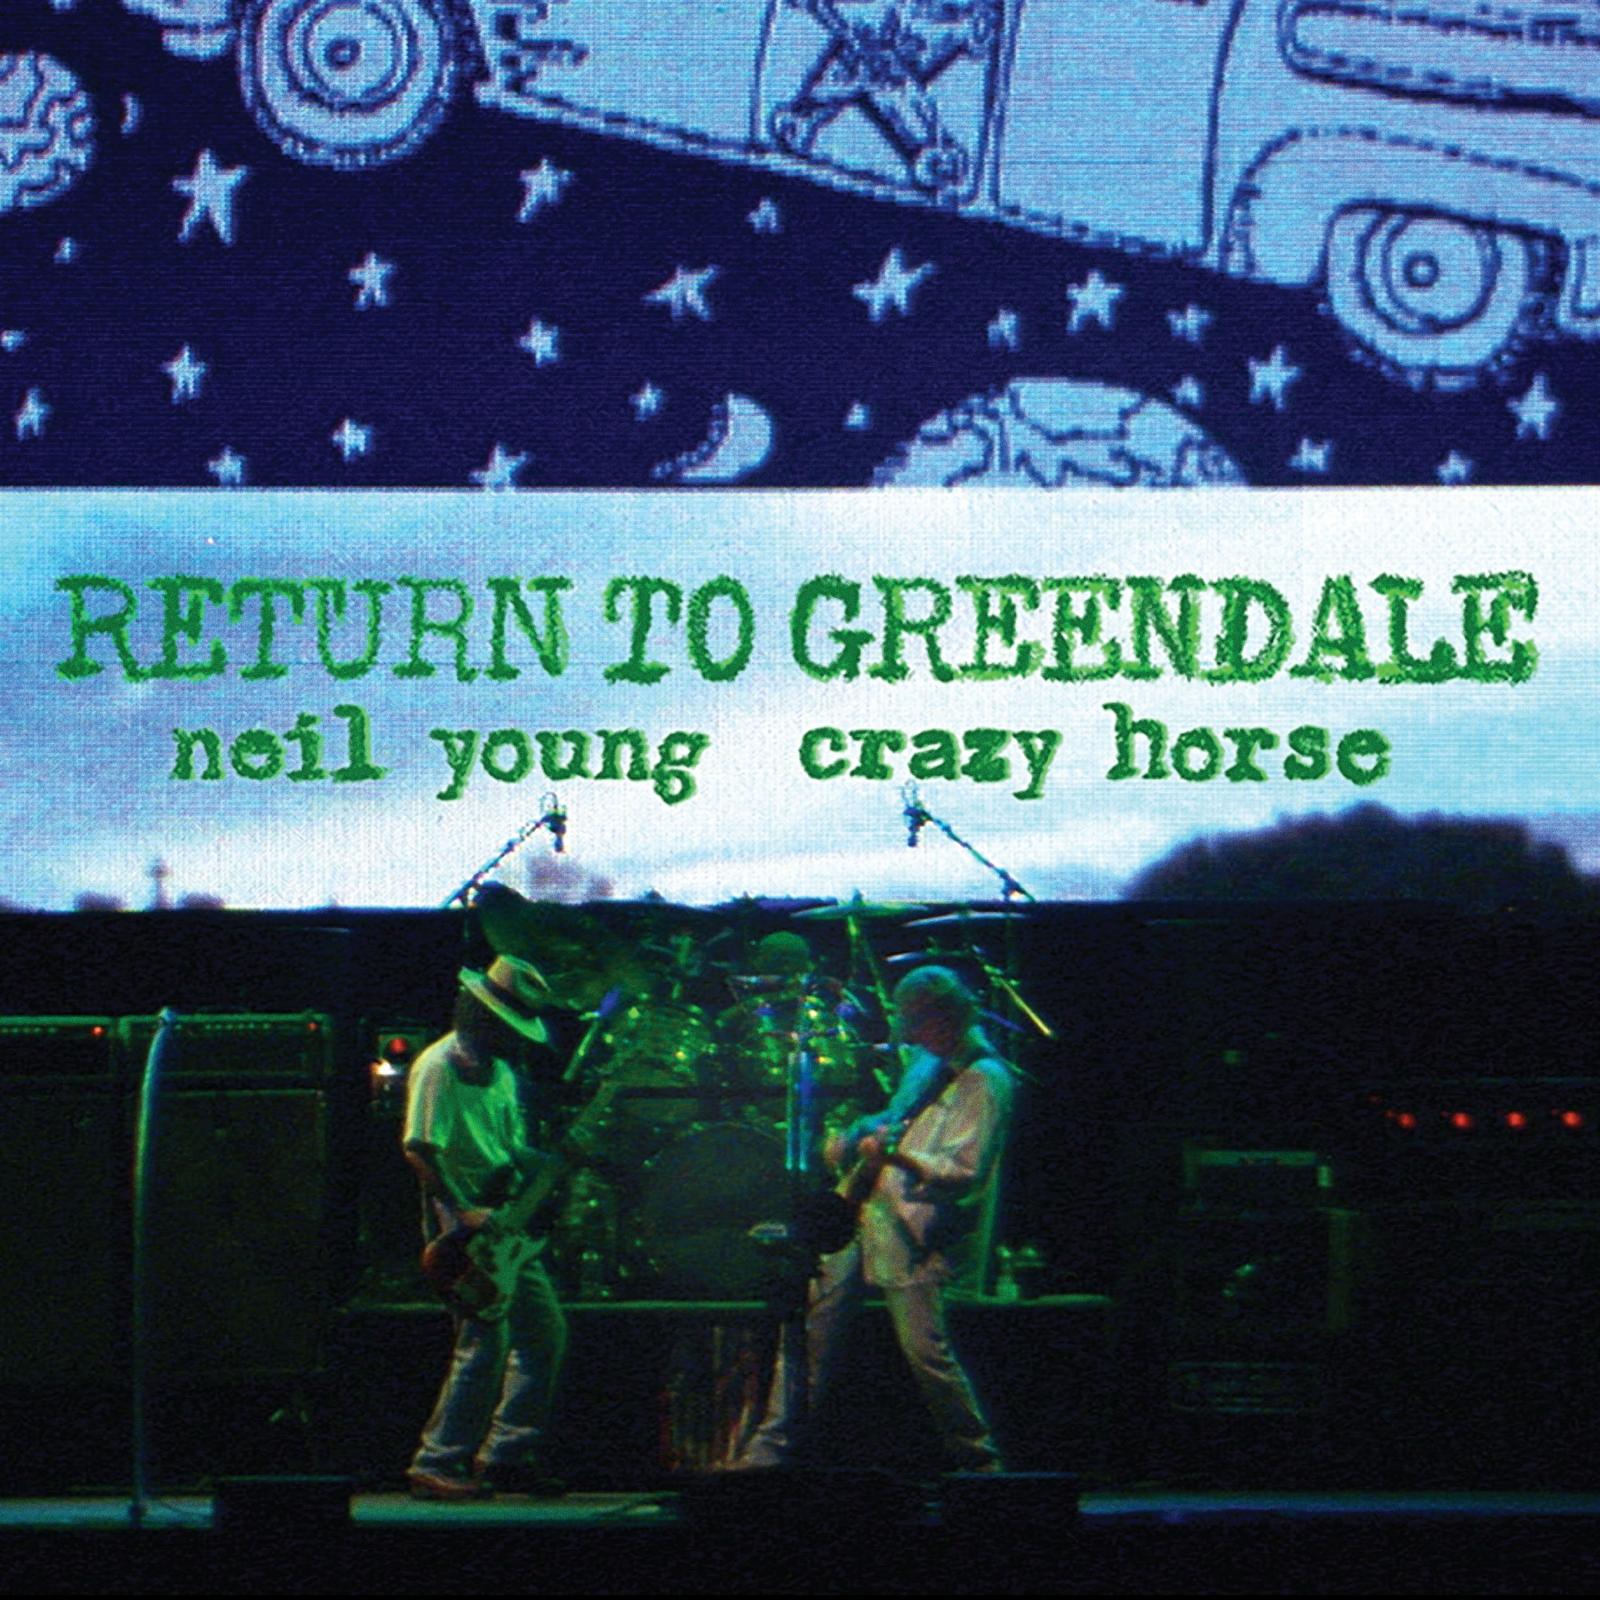 Виниловая пластинка Neil Young & Crazy Horse Return To Greendale